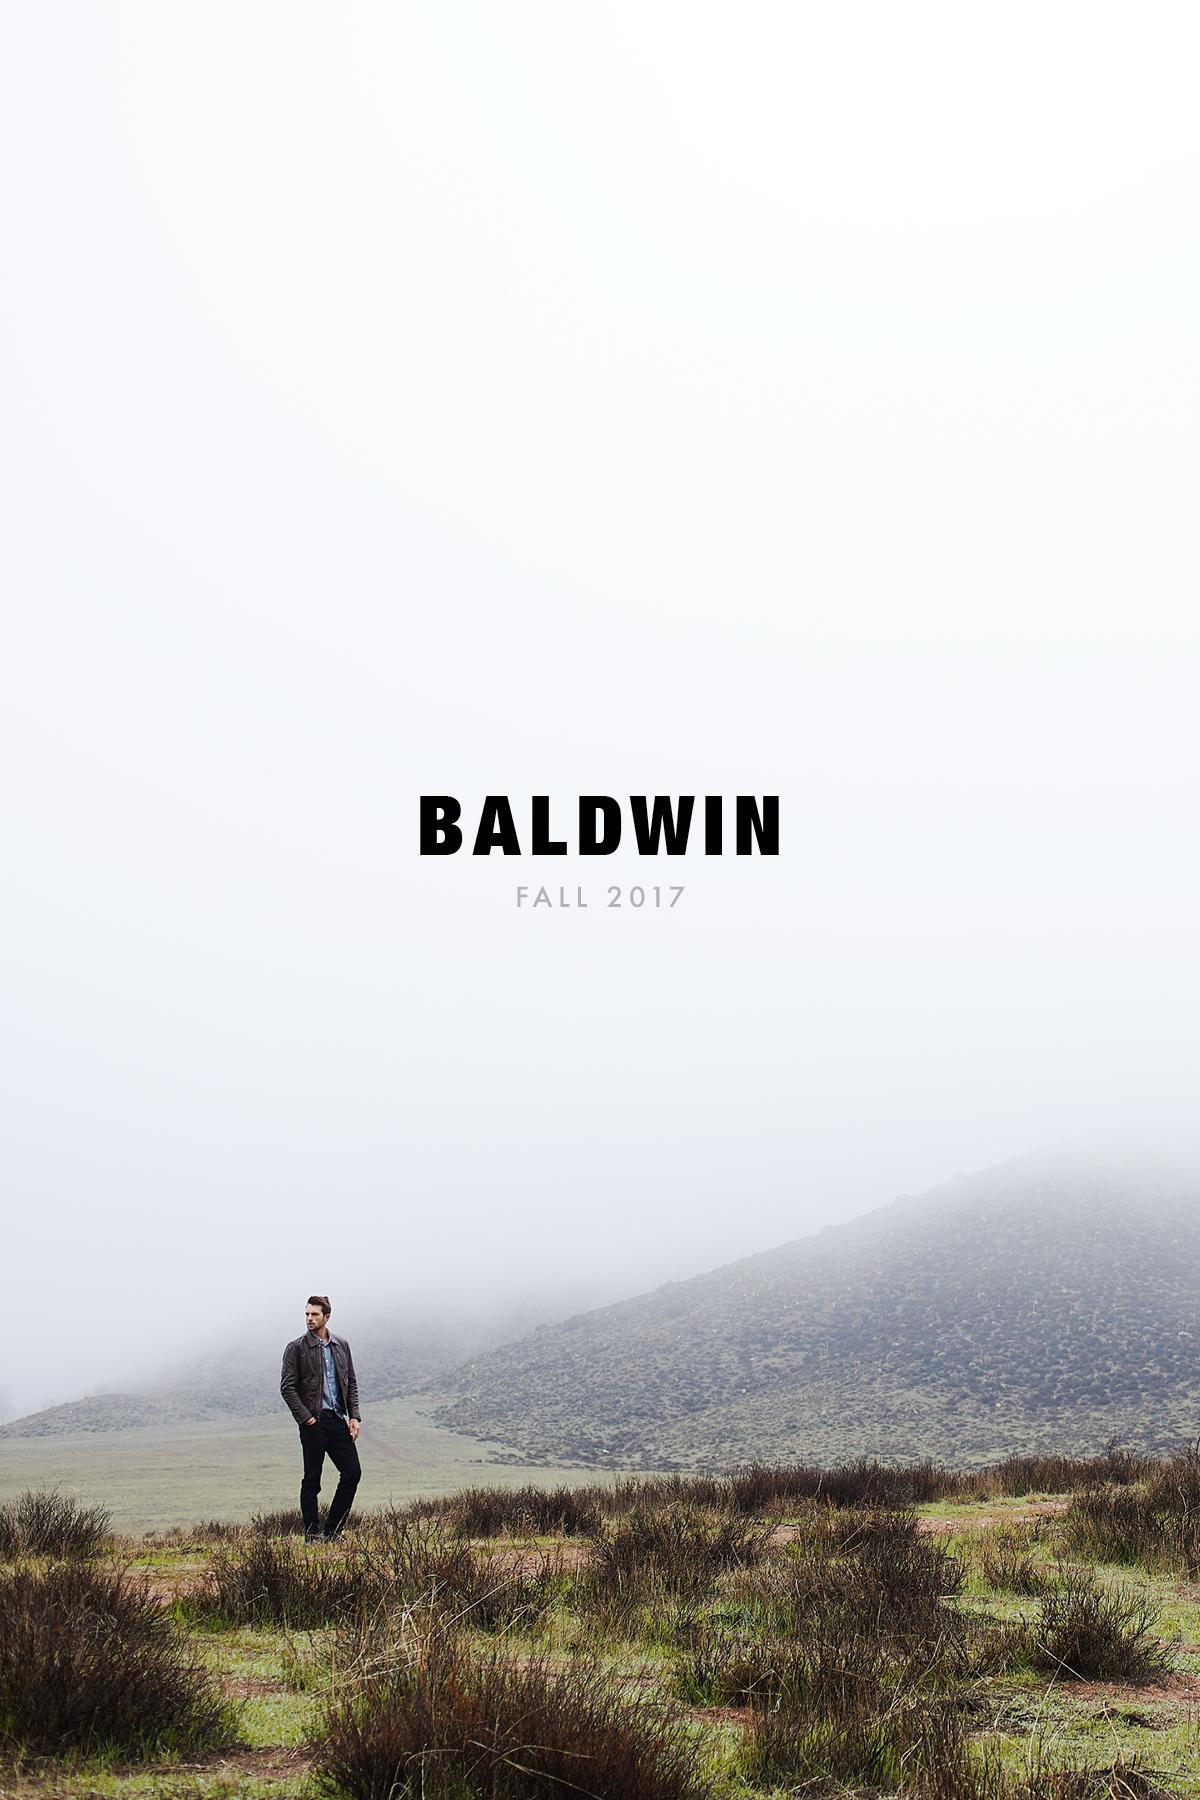 BALDWIN_FALL17-MEN_v2.jpg